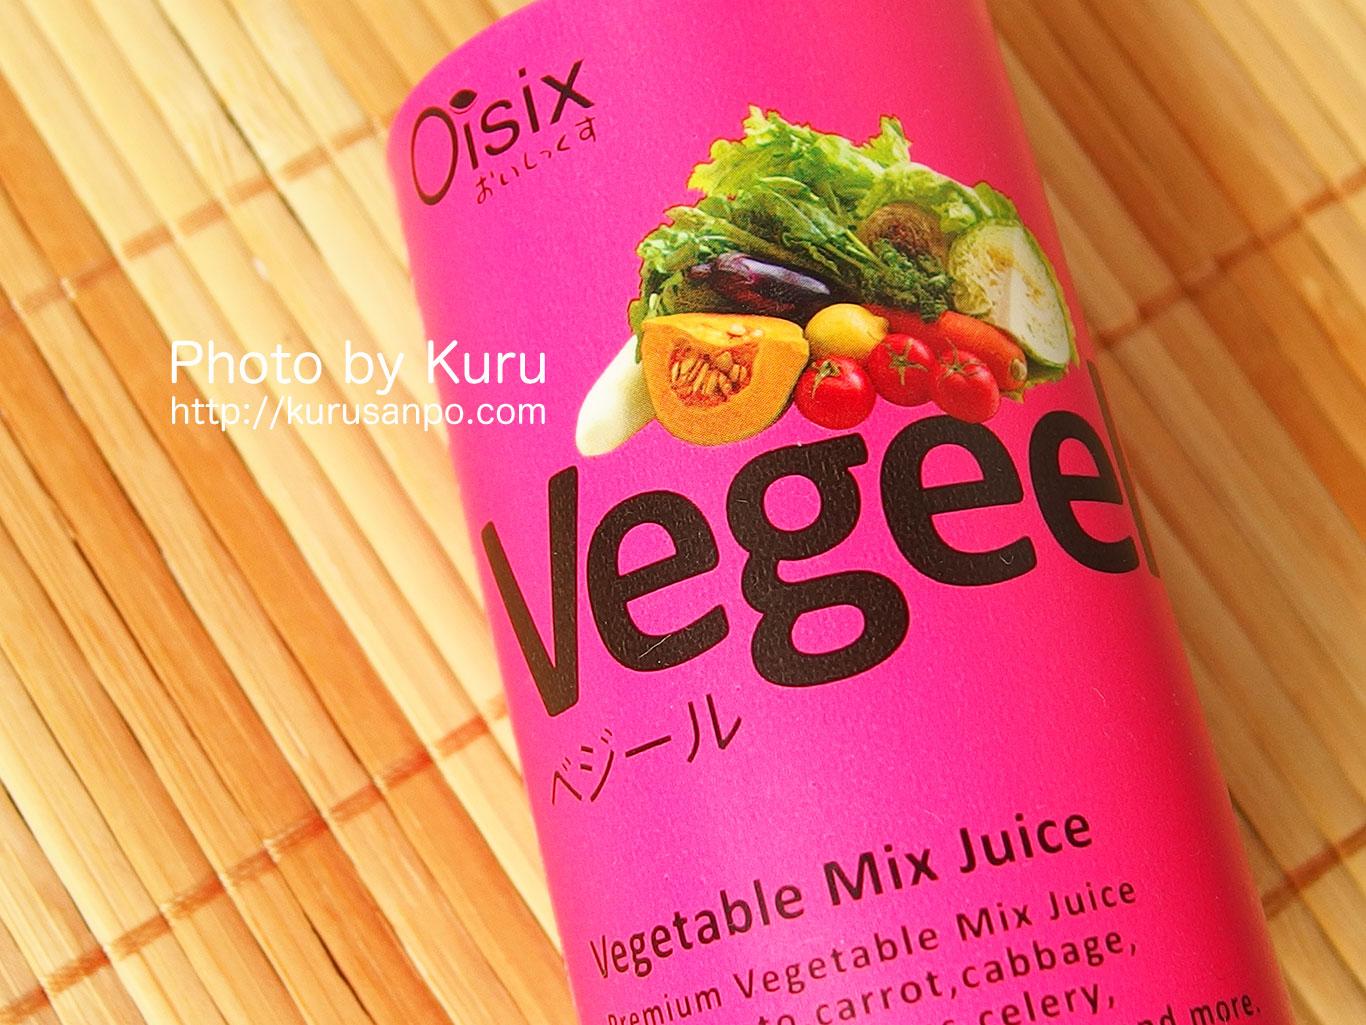 Oisix(おいしっくす)の『ベジール』は野菜そのままの野菜ジュース♪